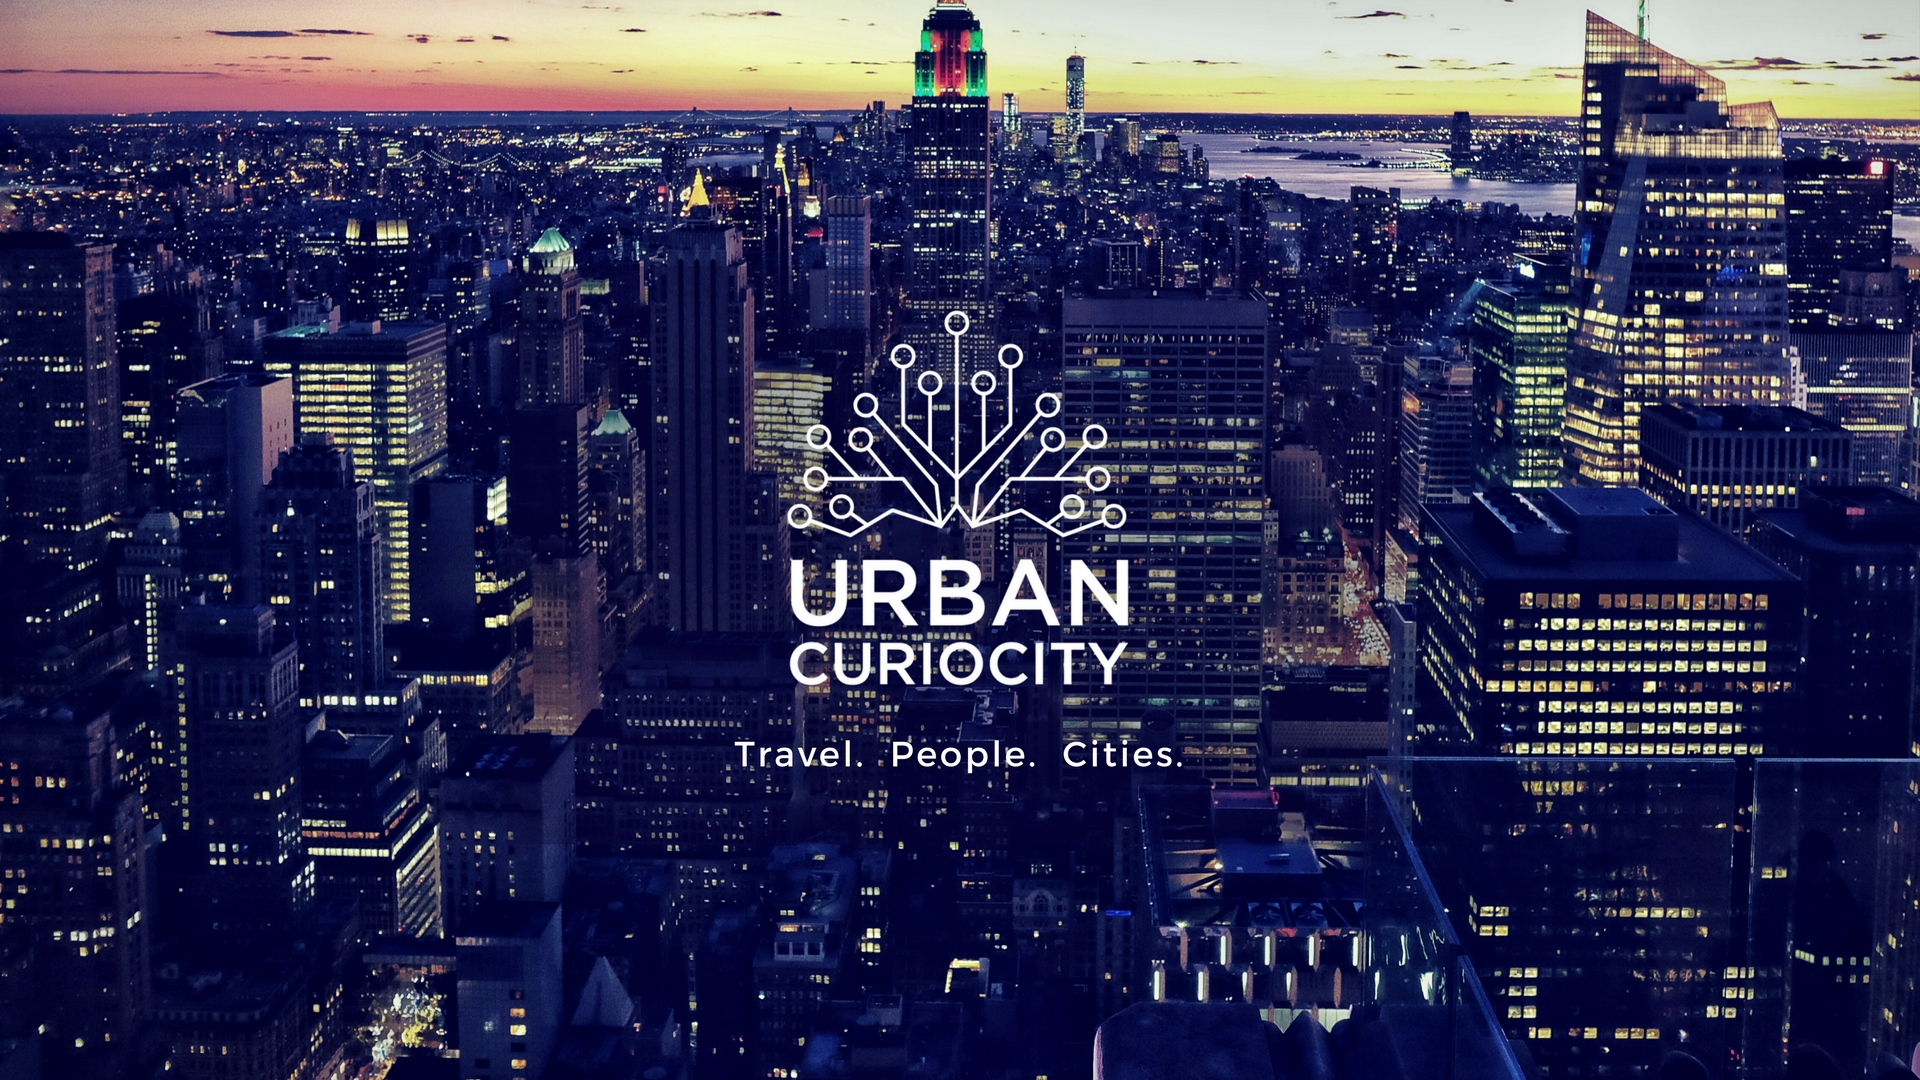 Urban CurioCity_city bg_blue_30%int.jpg